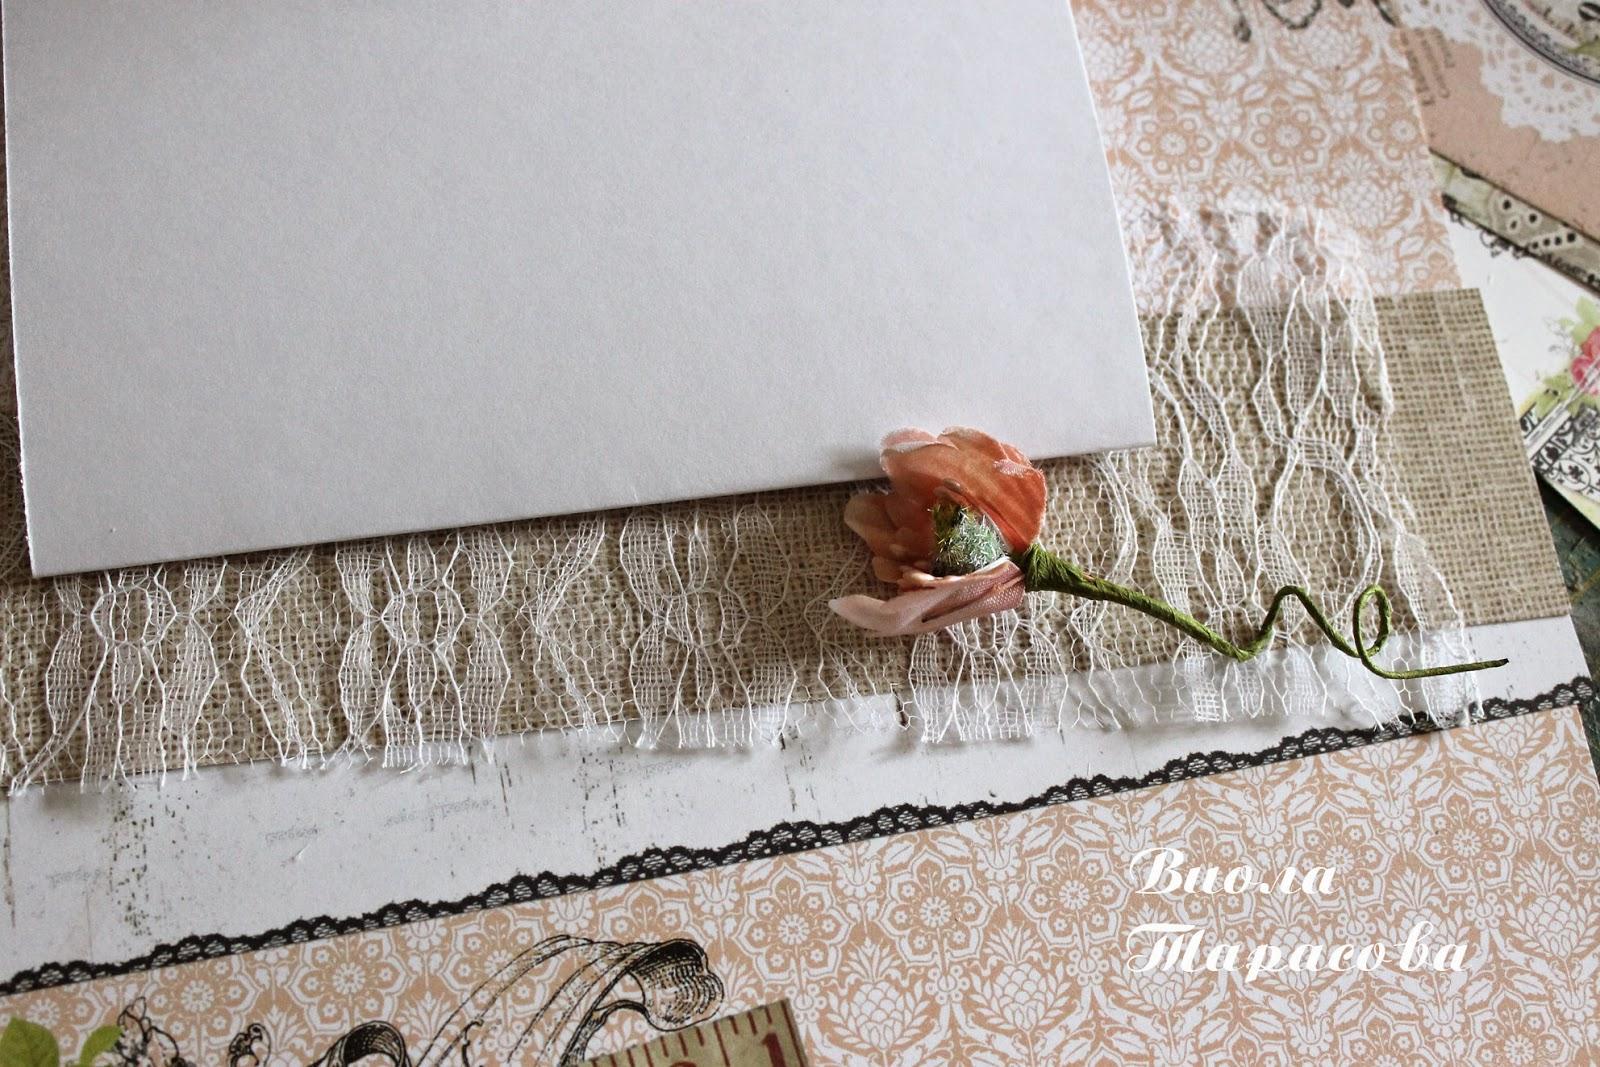 Что дарят на свадьбу родители жениха - идеи подарков, фото 75